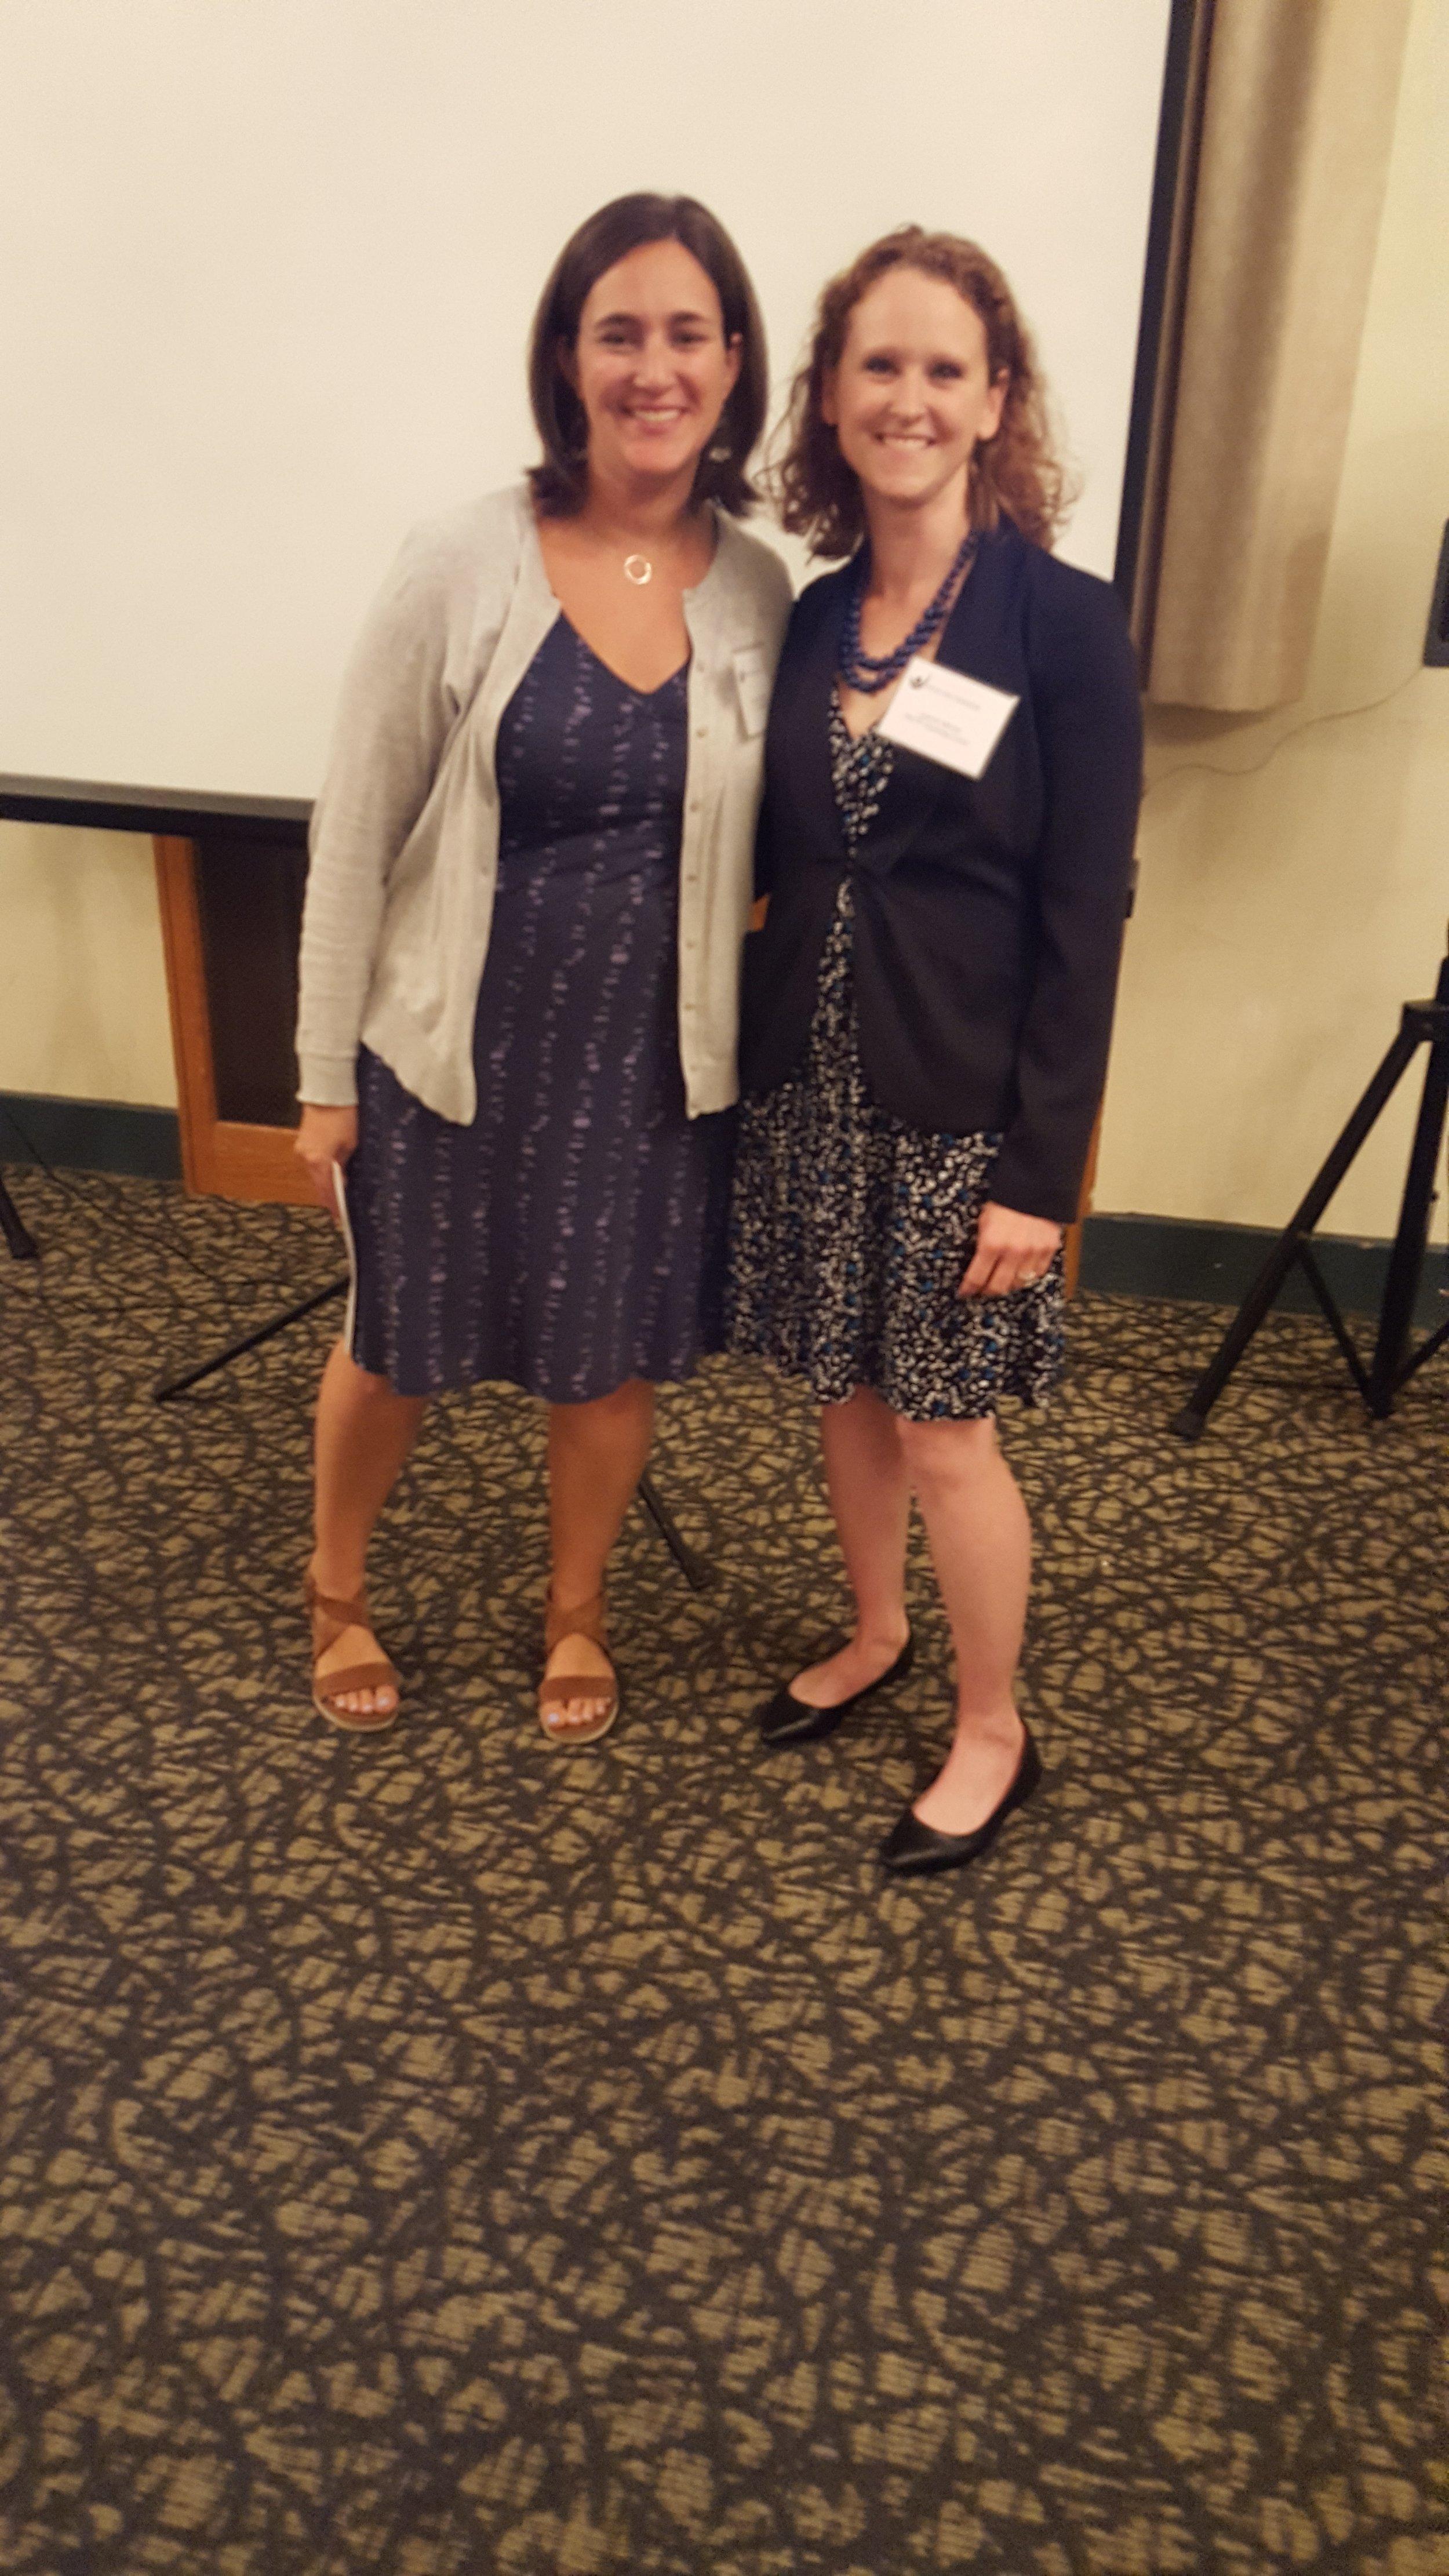 Special Kids Board Vice President Lauren Litchfield (Left) with PACTT Transition Specialist Lauren Mucha